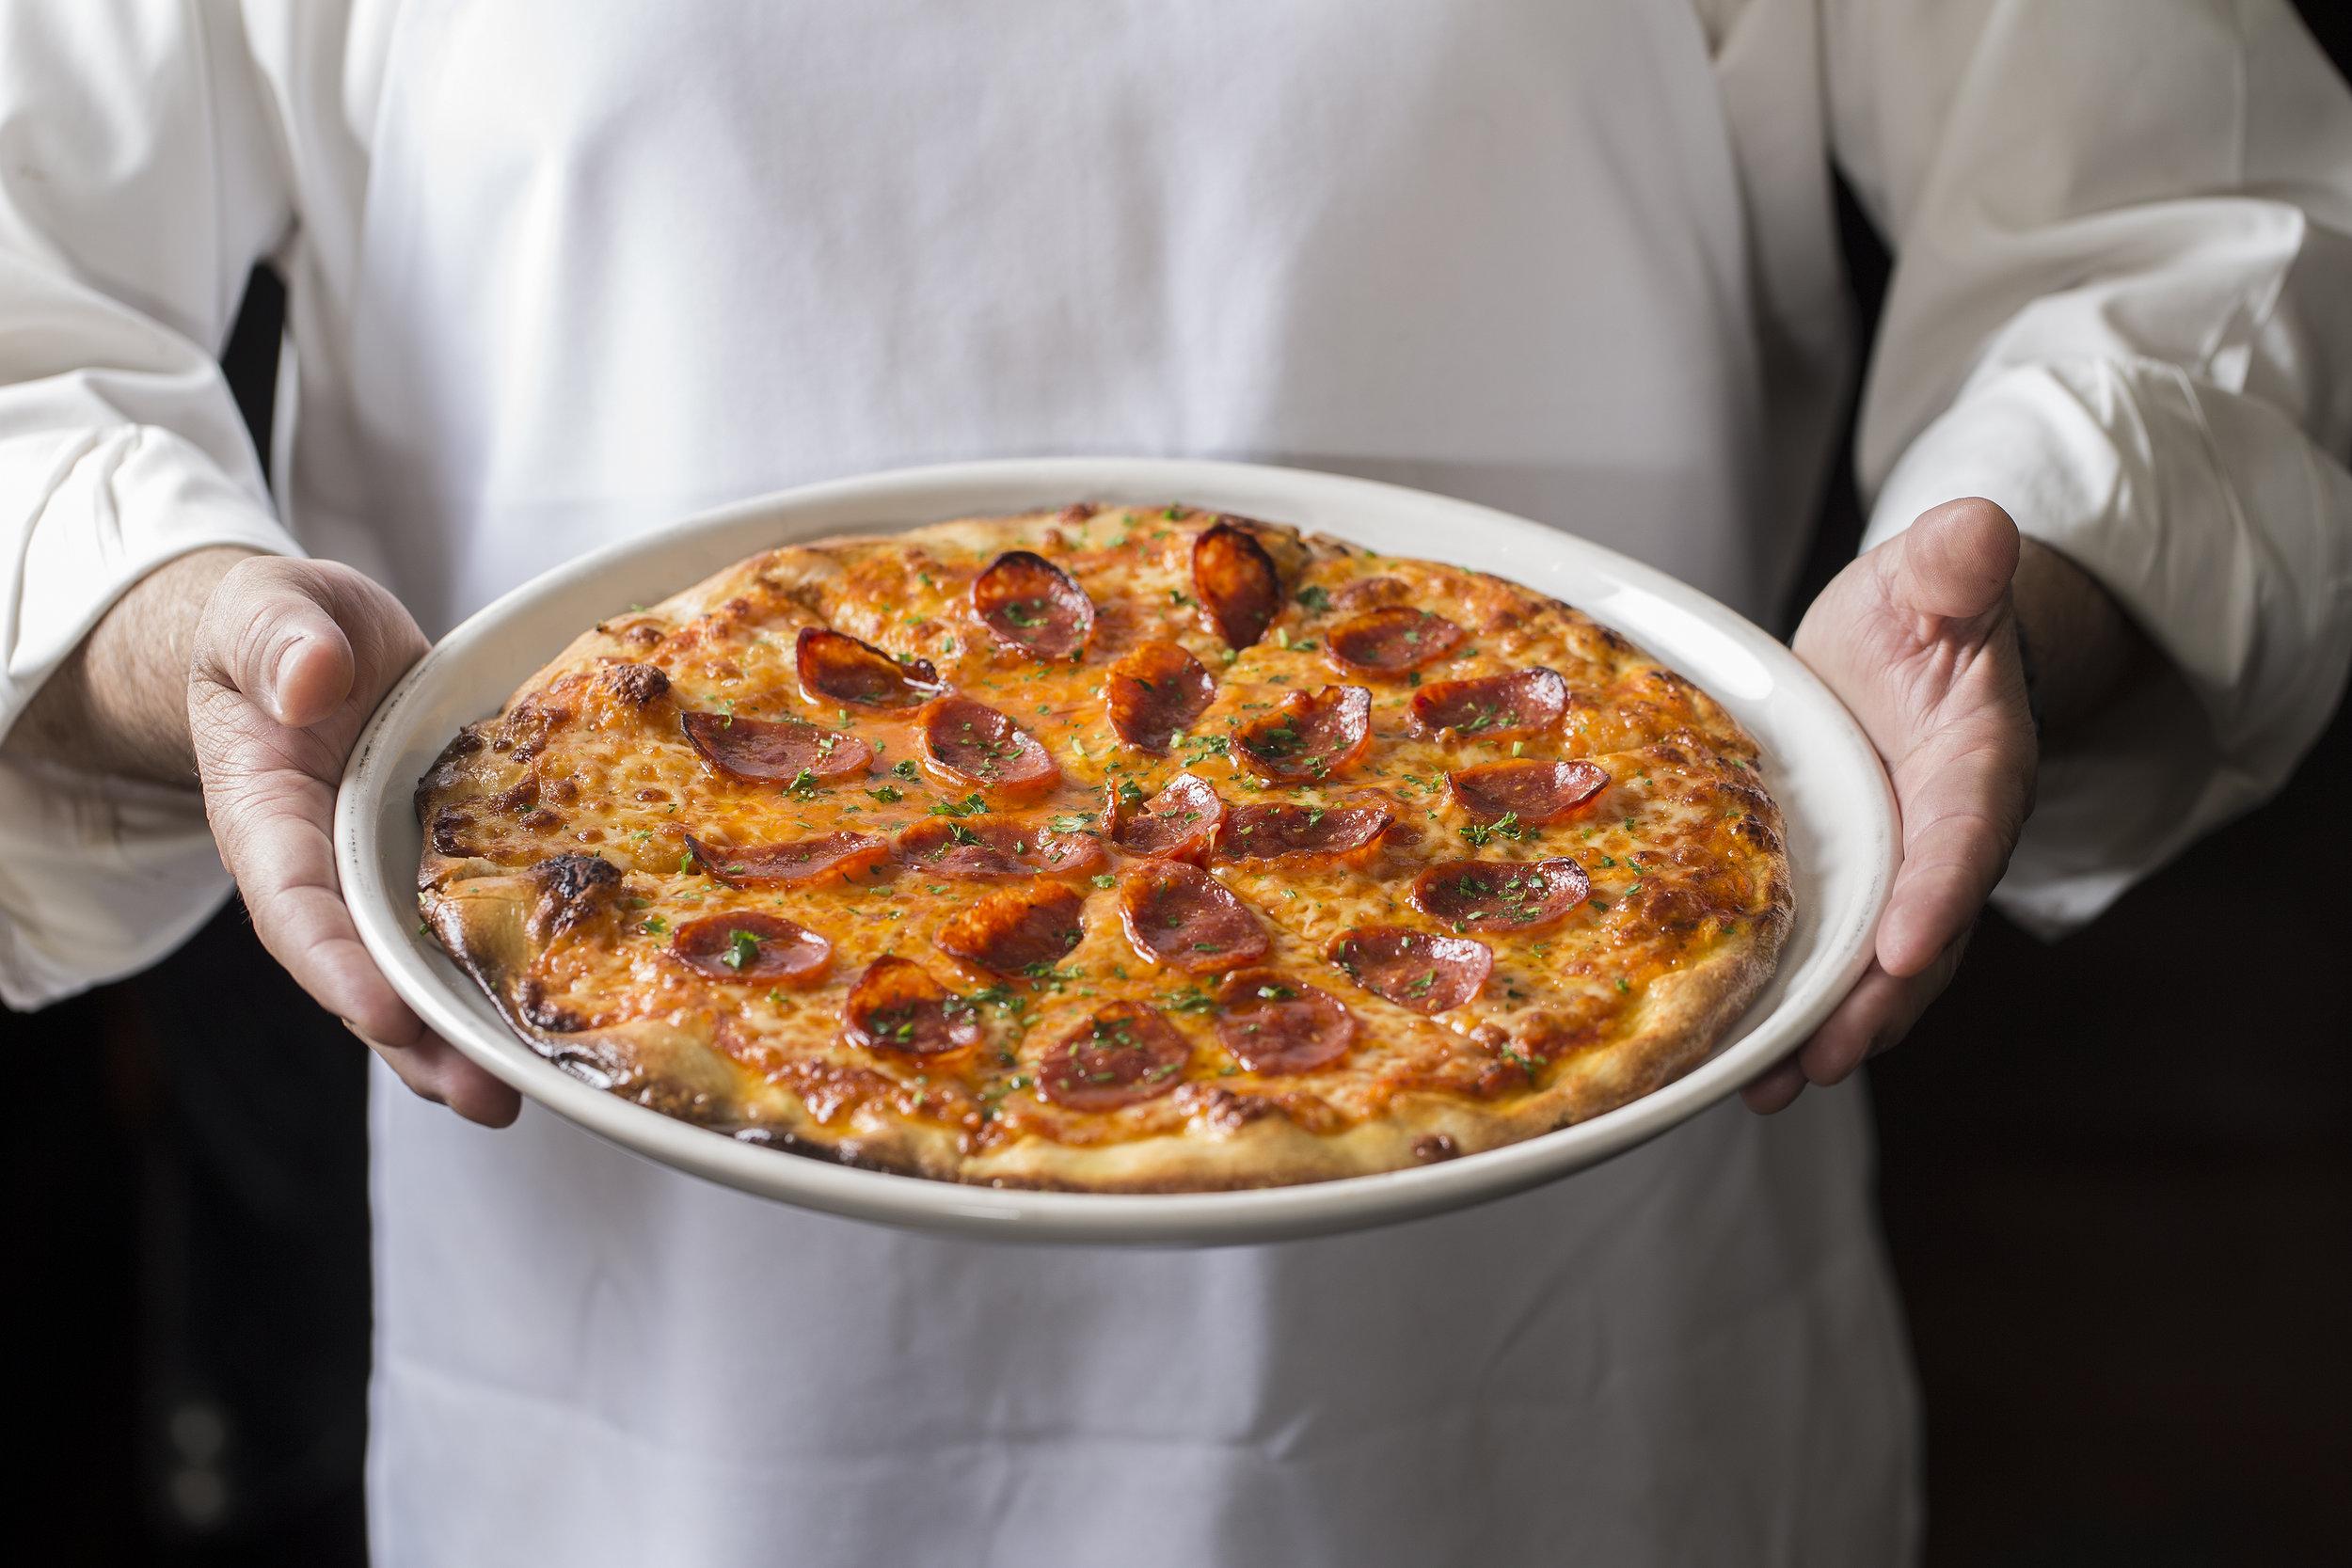 PepperoniPizza41.jpg